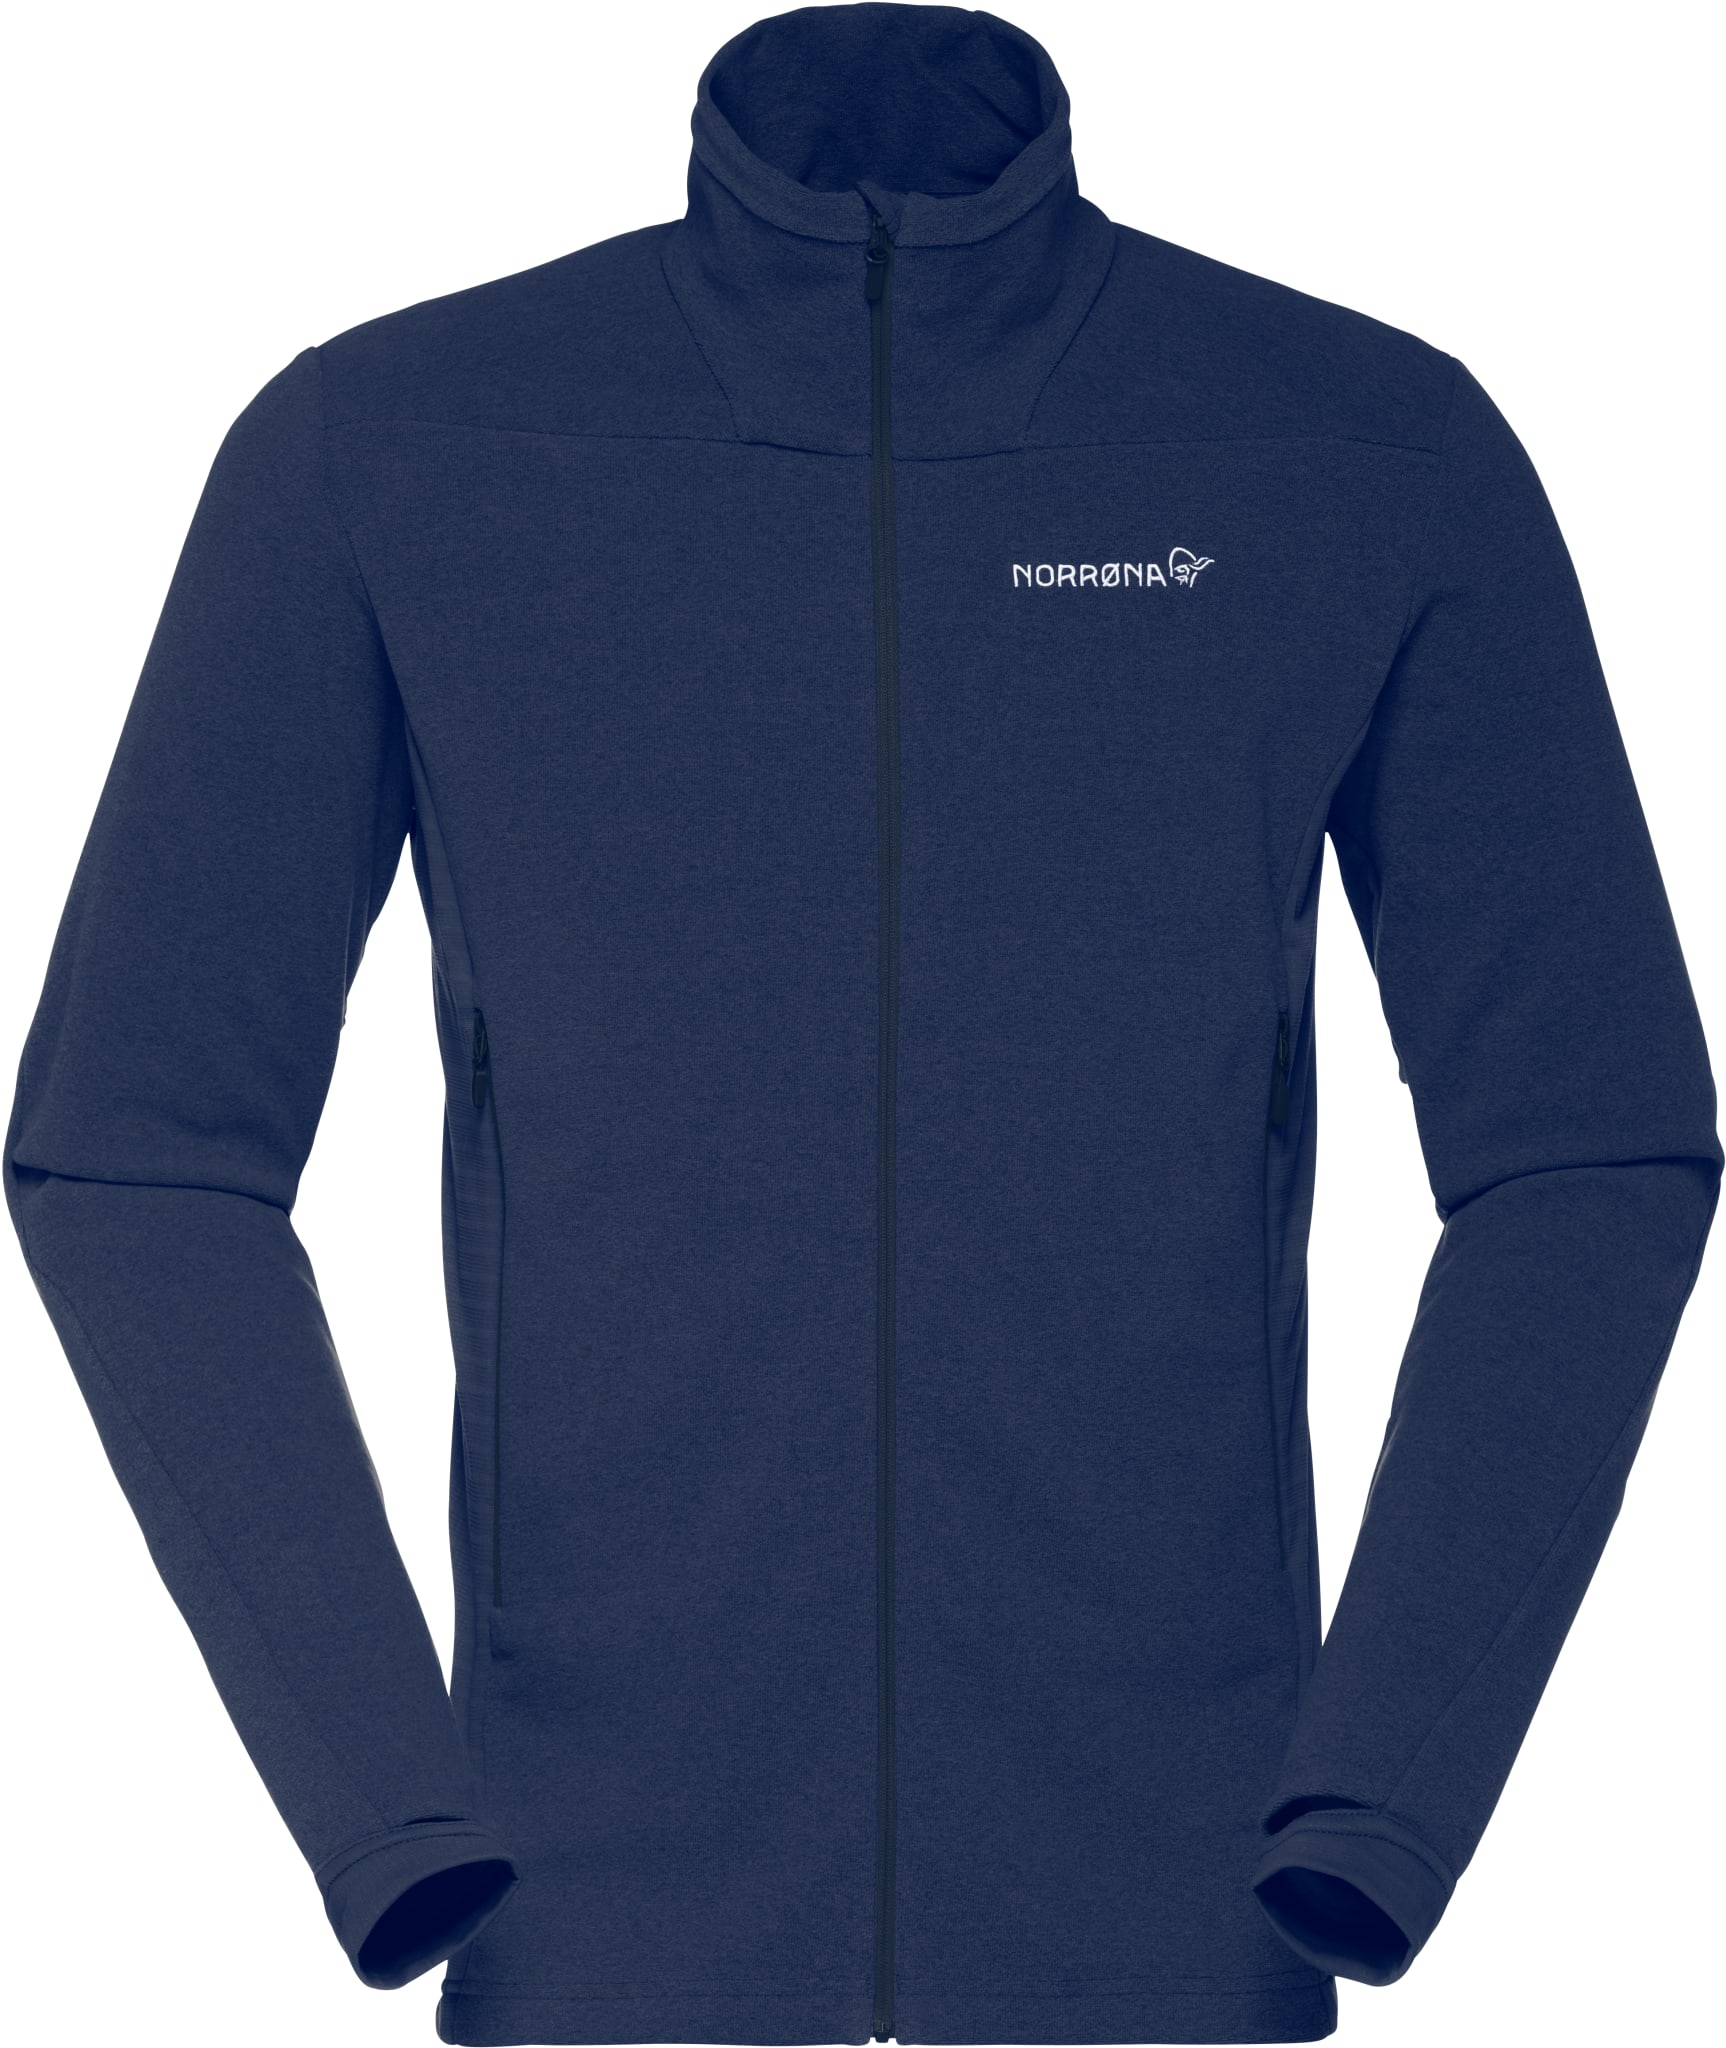 Falketind Warm1 Jacket